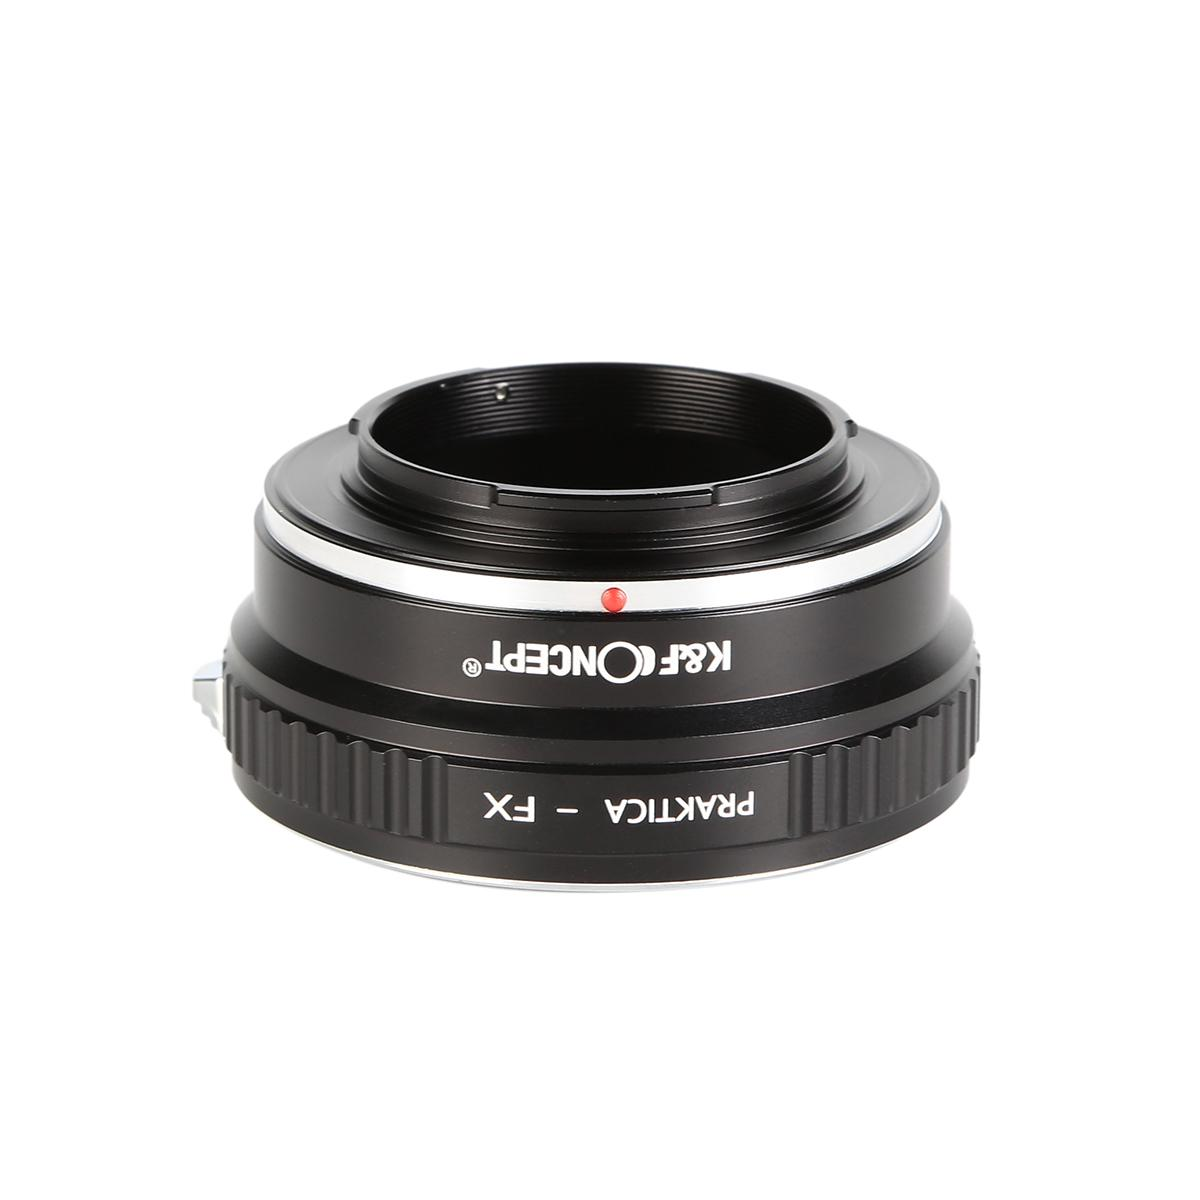 Adapter für Praktica B Objektiv auf Fuji X Mount Kamera